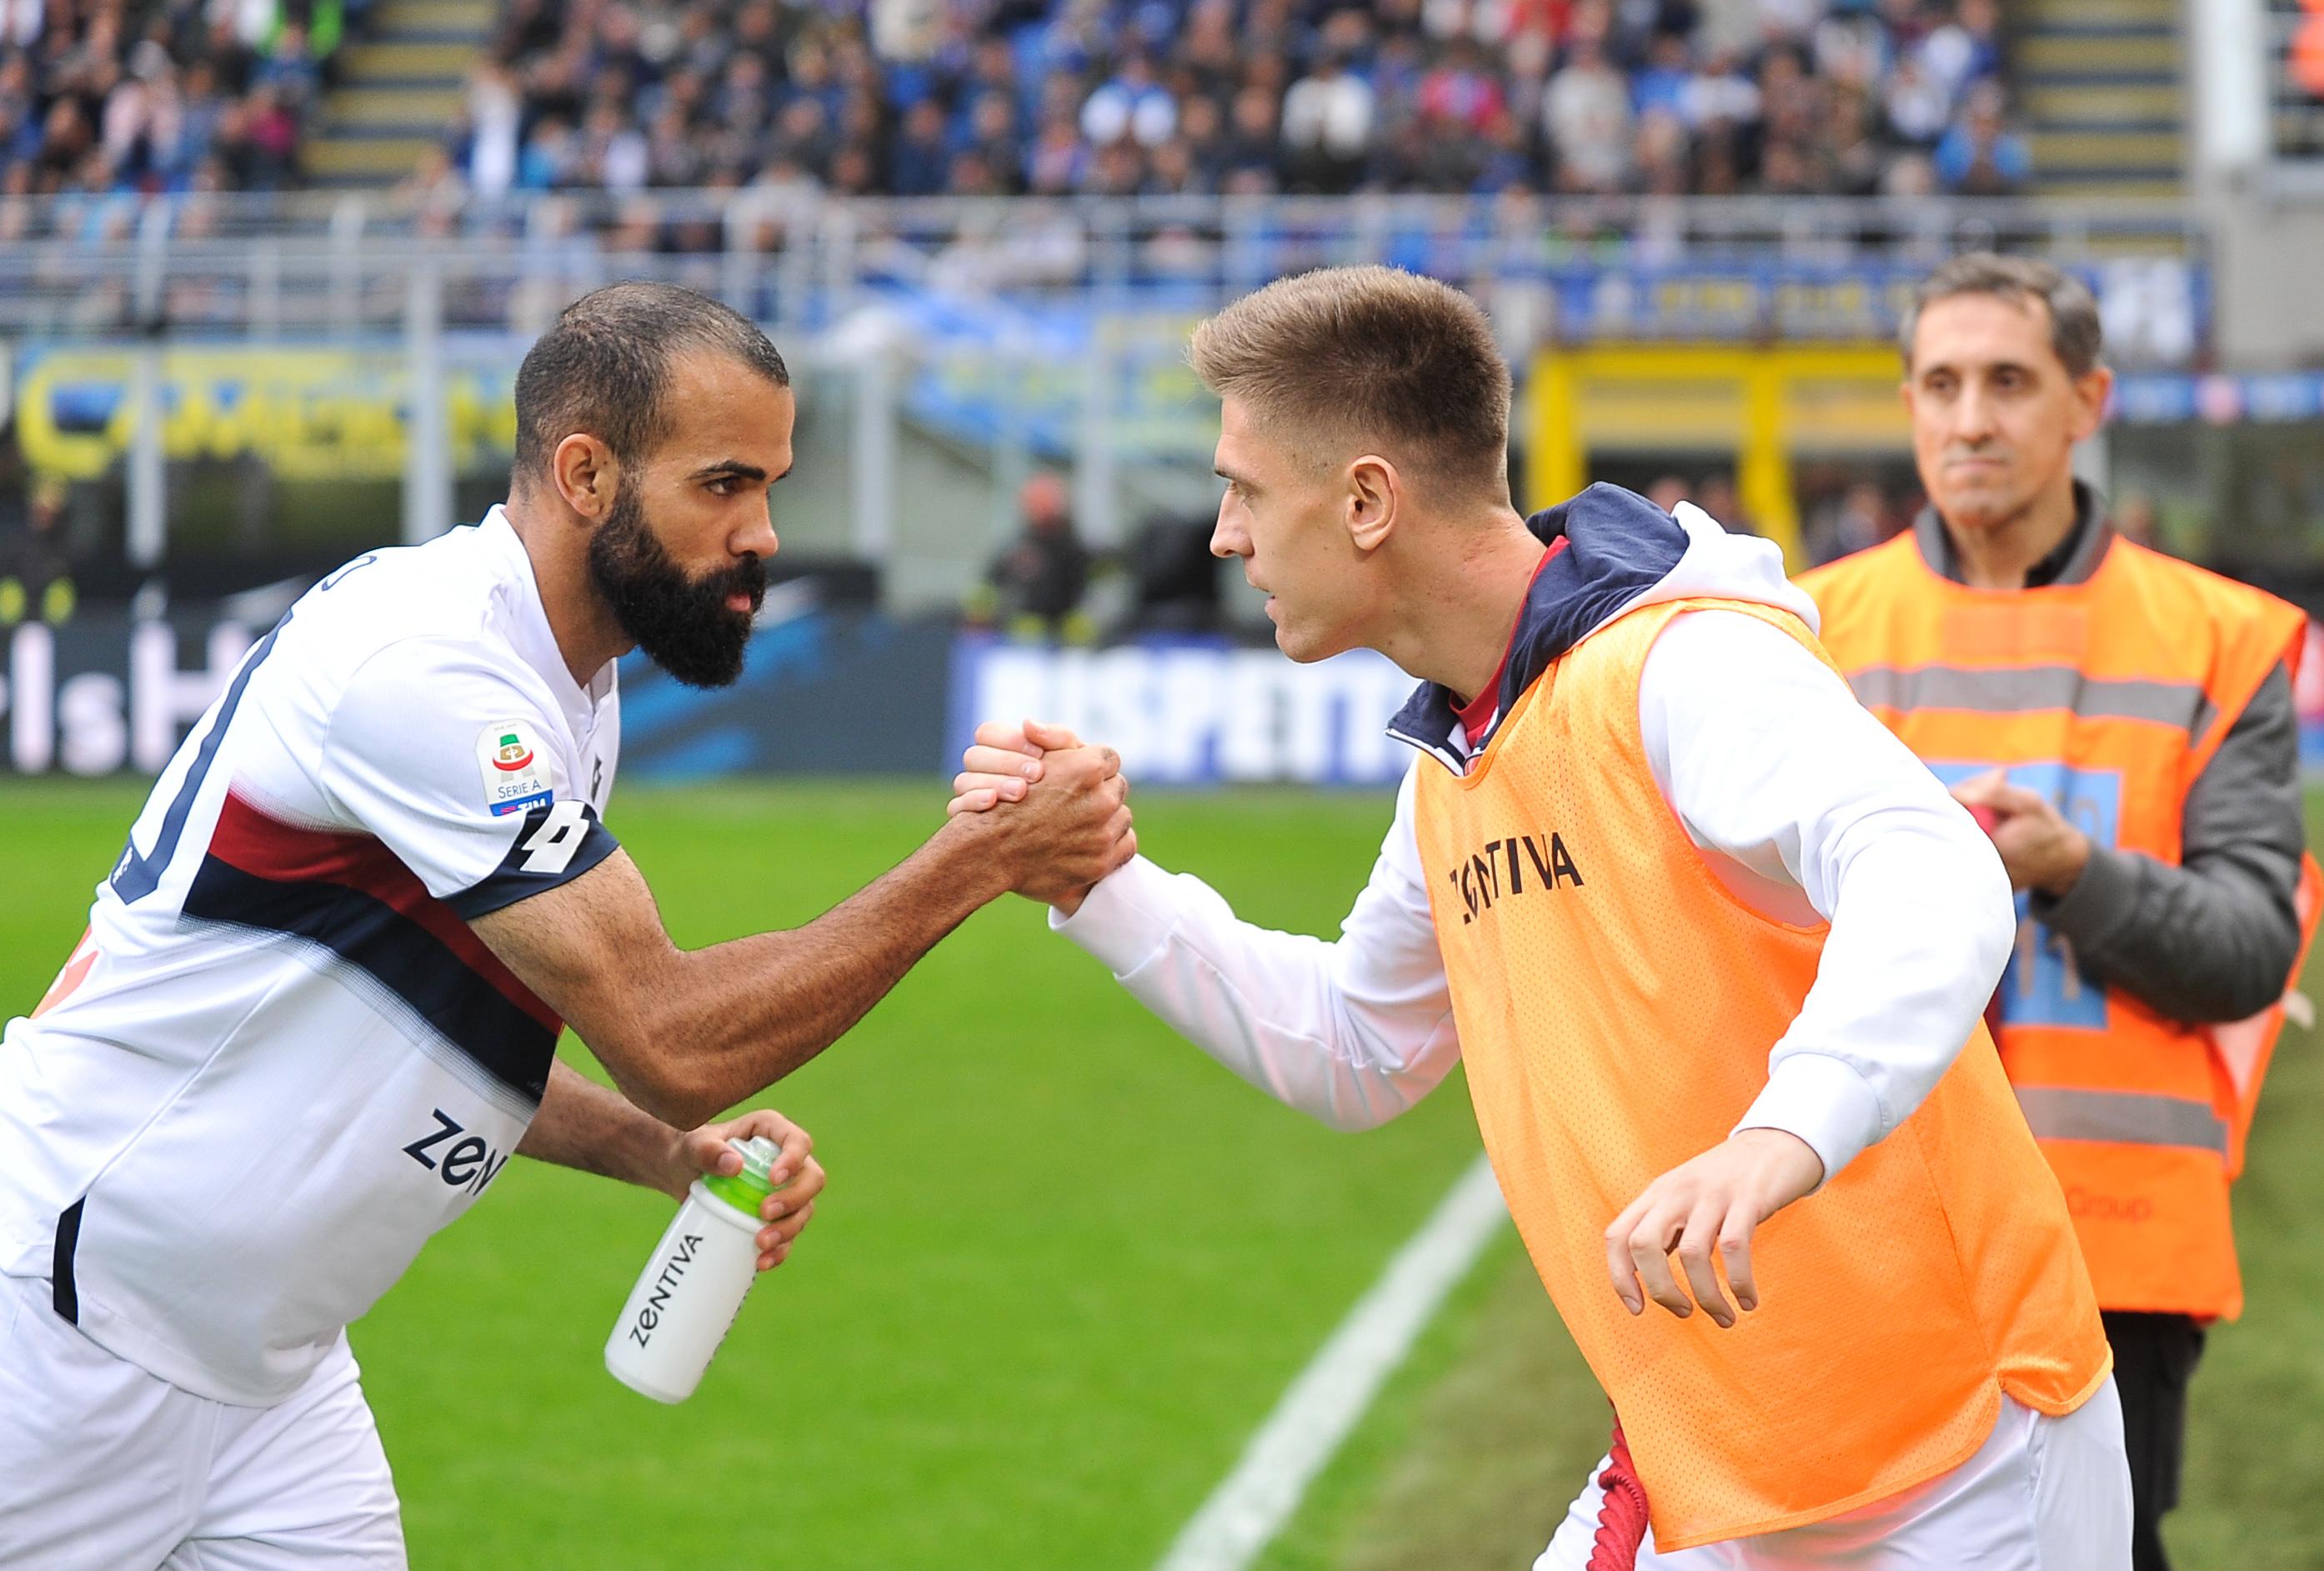 03.11.2018 Mediolan, Pilka nozna, Serie A, liga wloska 2018/2019, Inter Mediolan - Genoa CFC N/z Koray Gunter, Krzysztof Piatek, Foto Norbert Barczyk / PressFocus